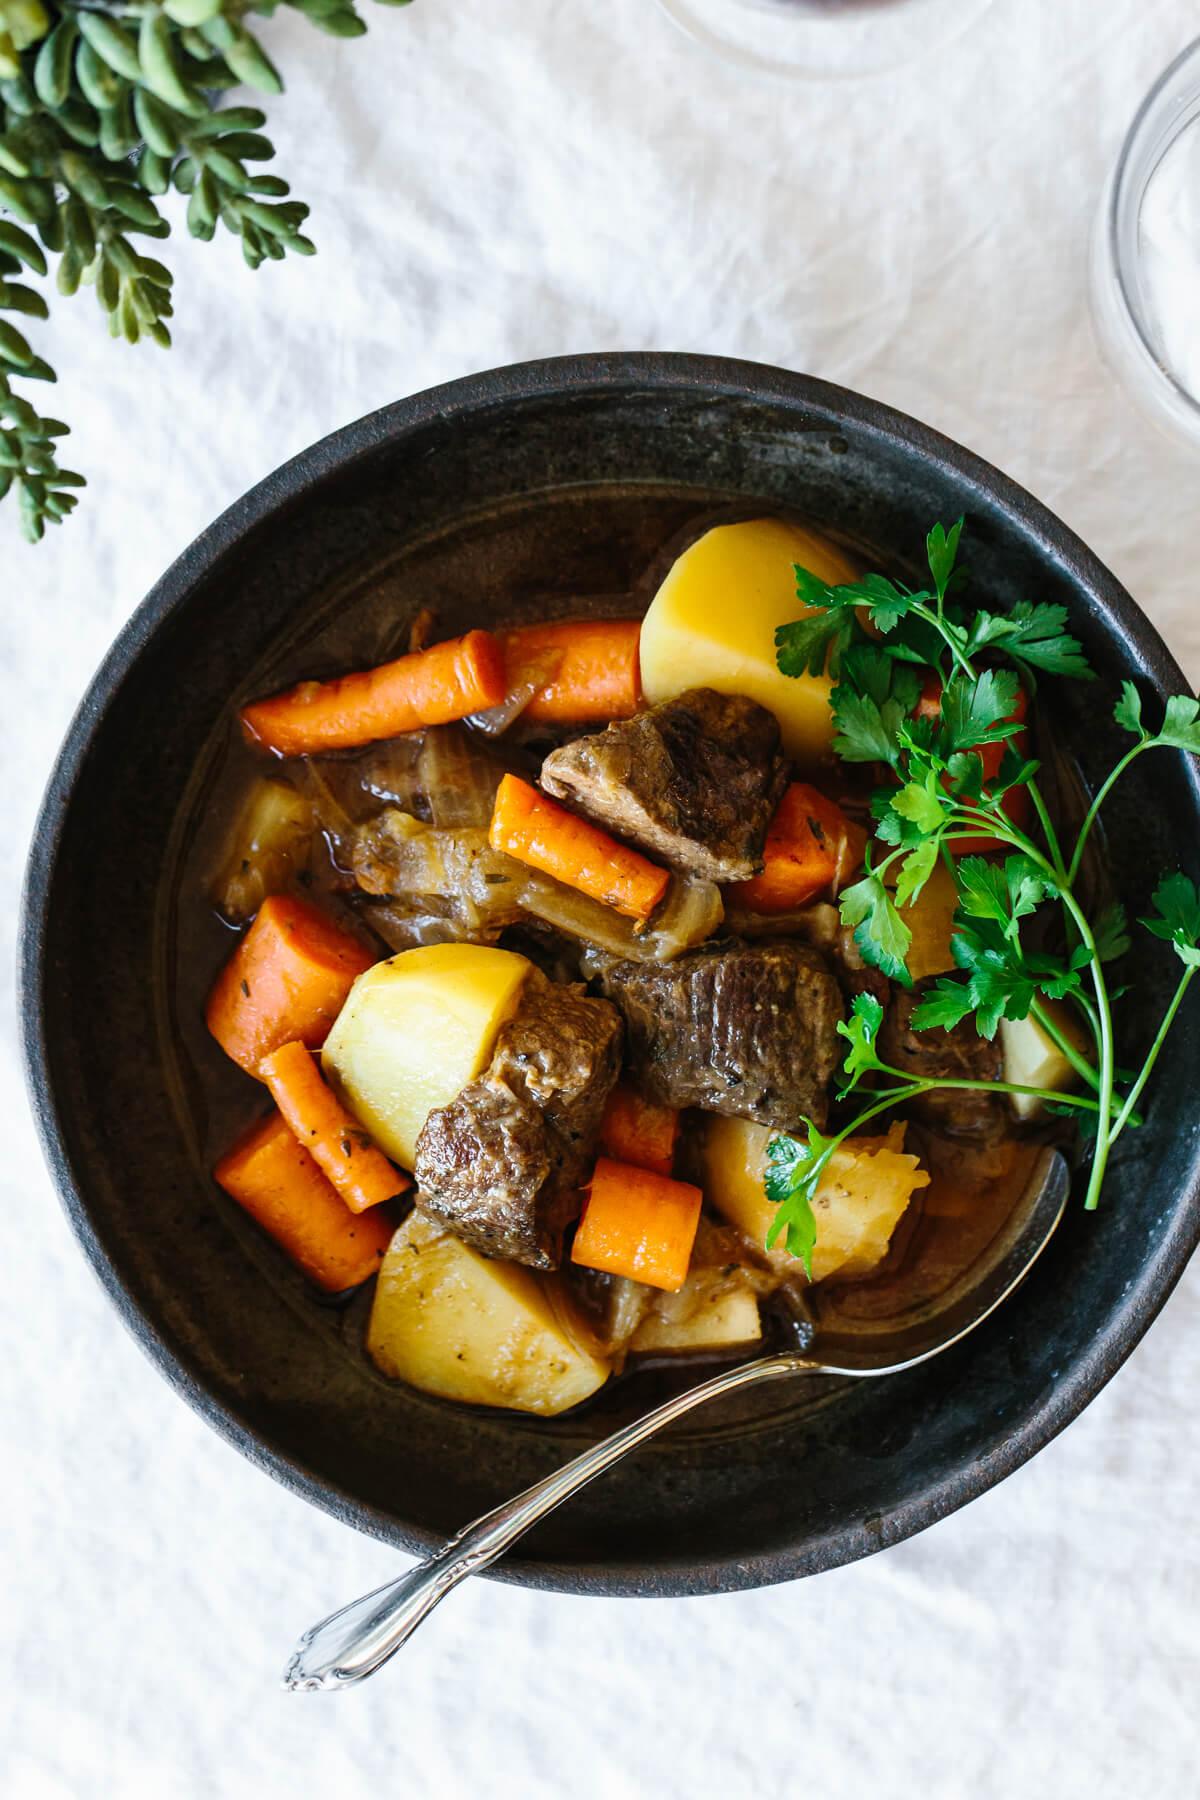 Lamb stew in a bowl.